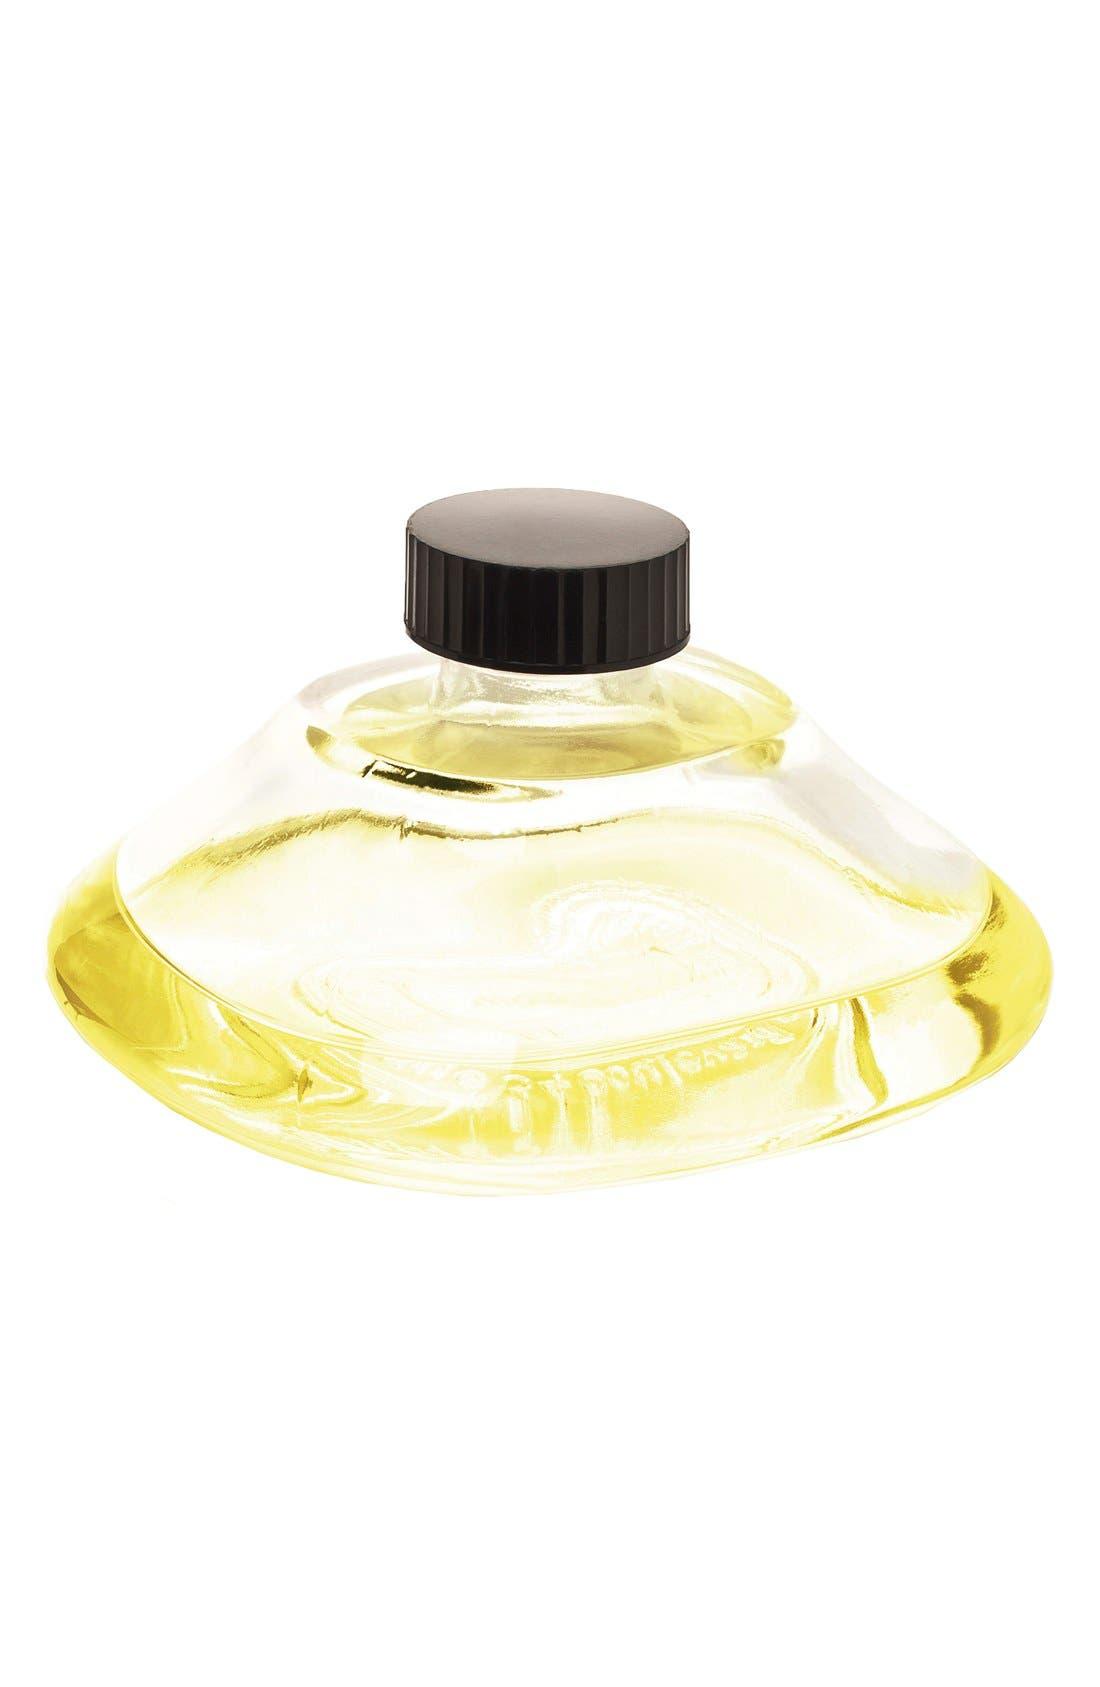 Main Image - diptyque 'Orange Blossom' Hourglass Diffuser Refill